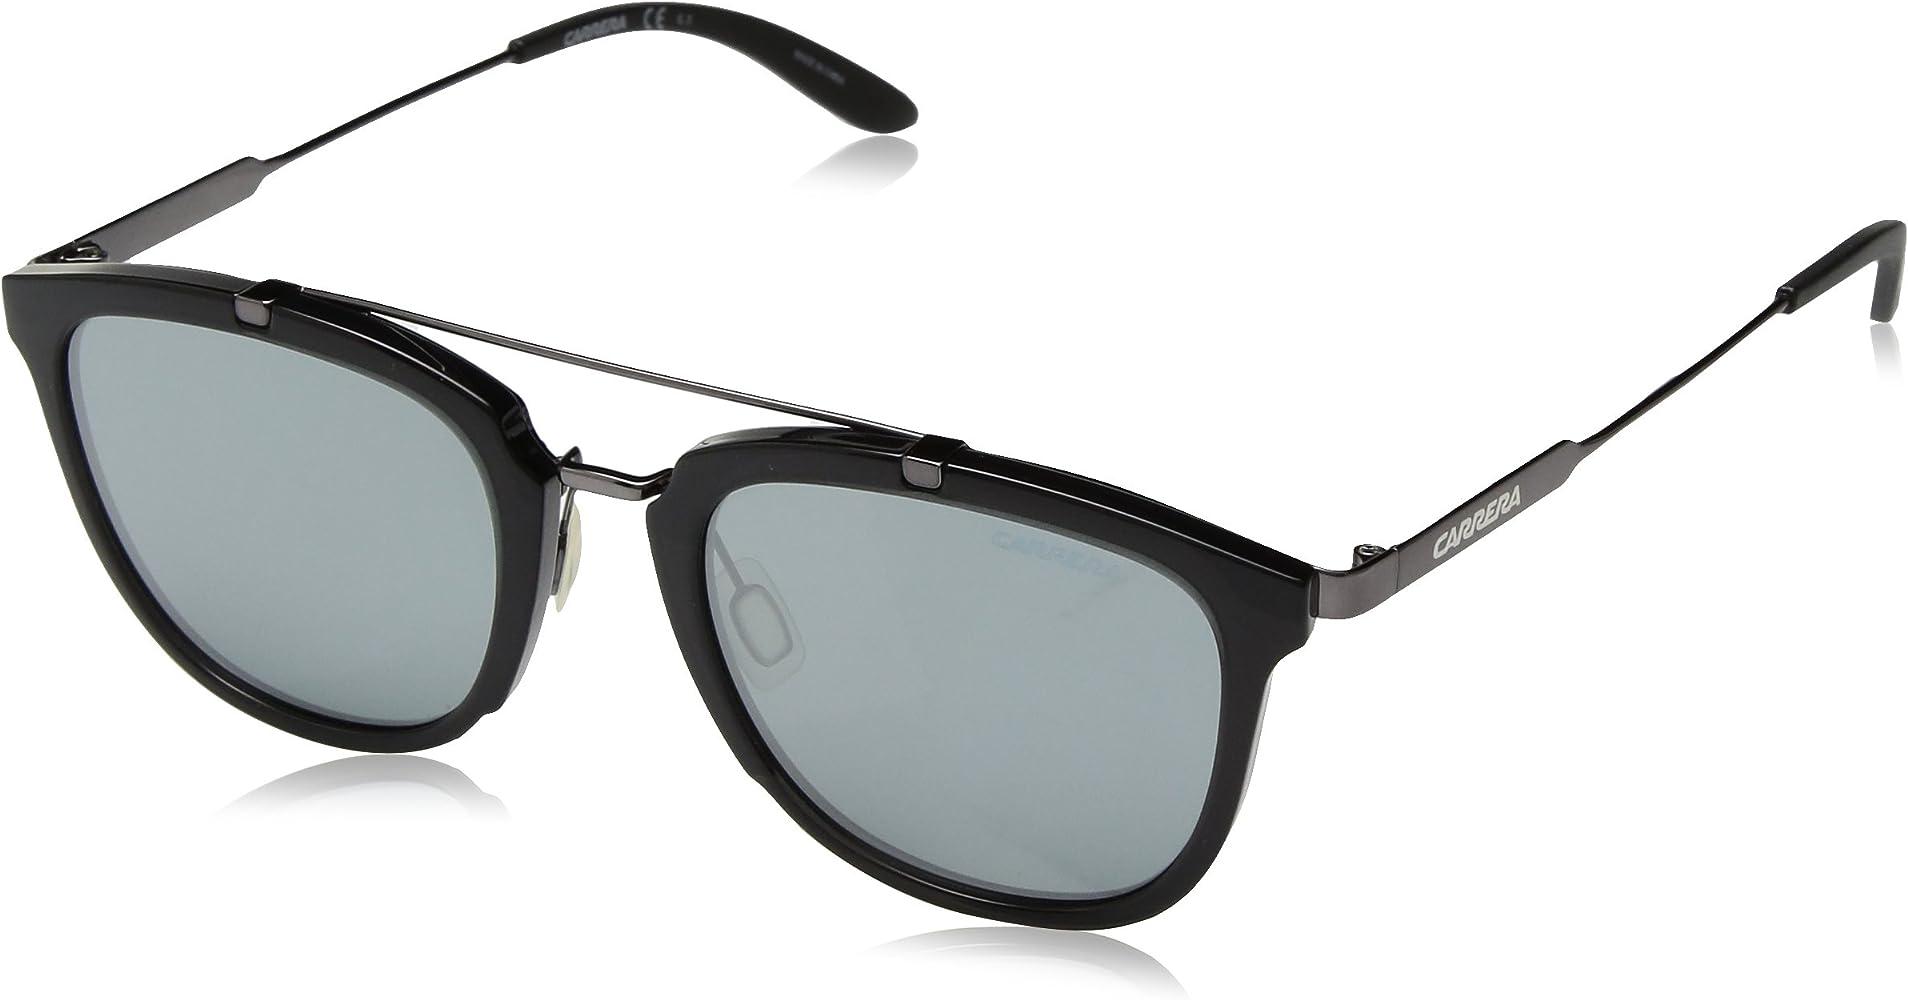 Amazon.com: Carrera Ca127s - Gafas de sol cuadradas para ...